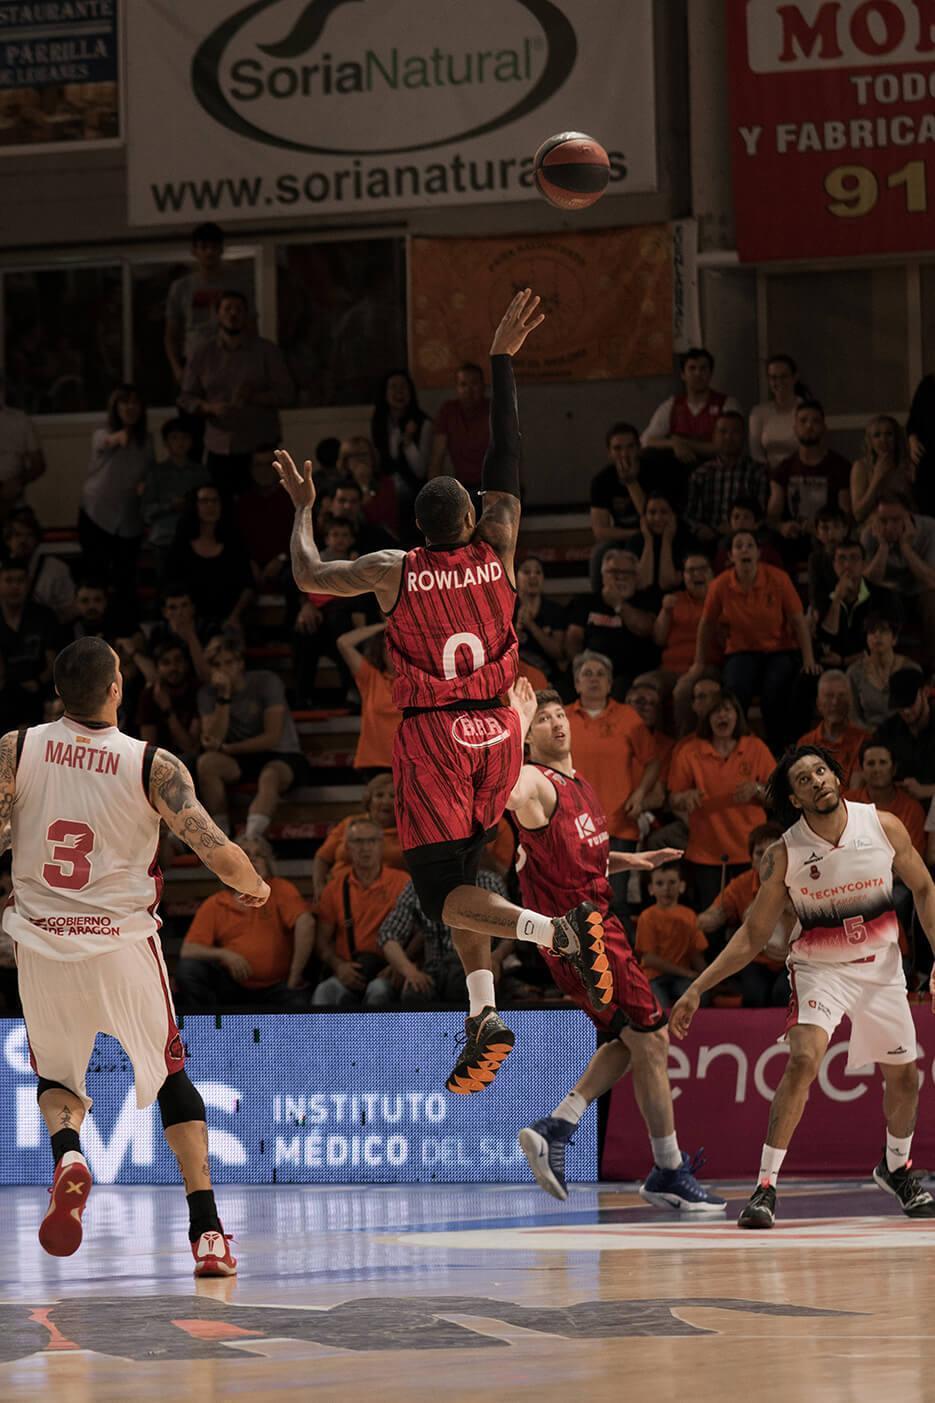 Fuenlabrada VS Zaragoza - Rowland 2